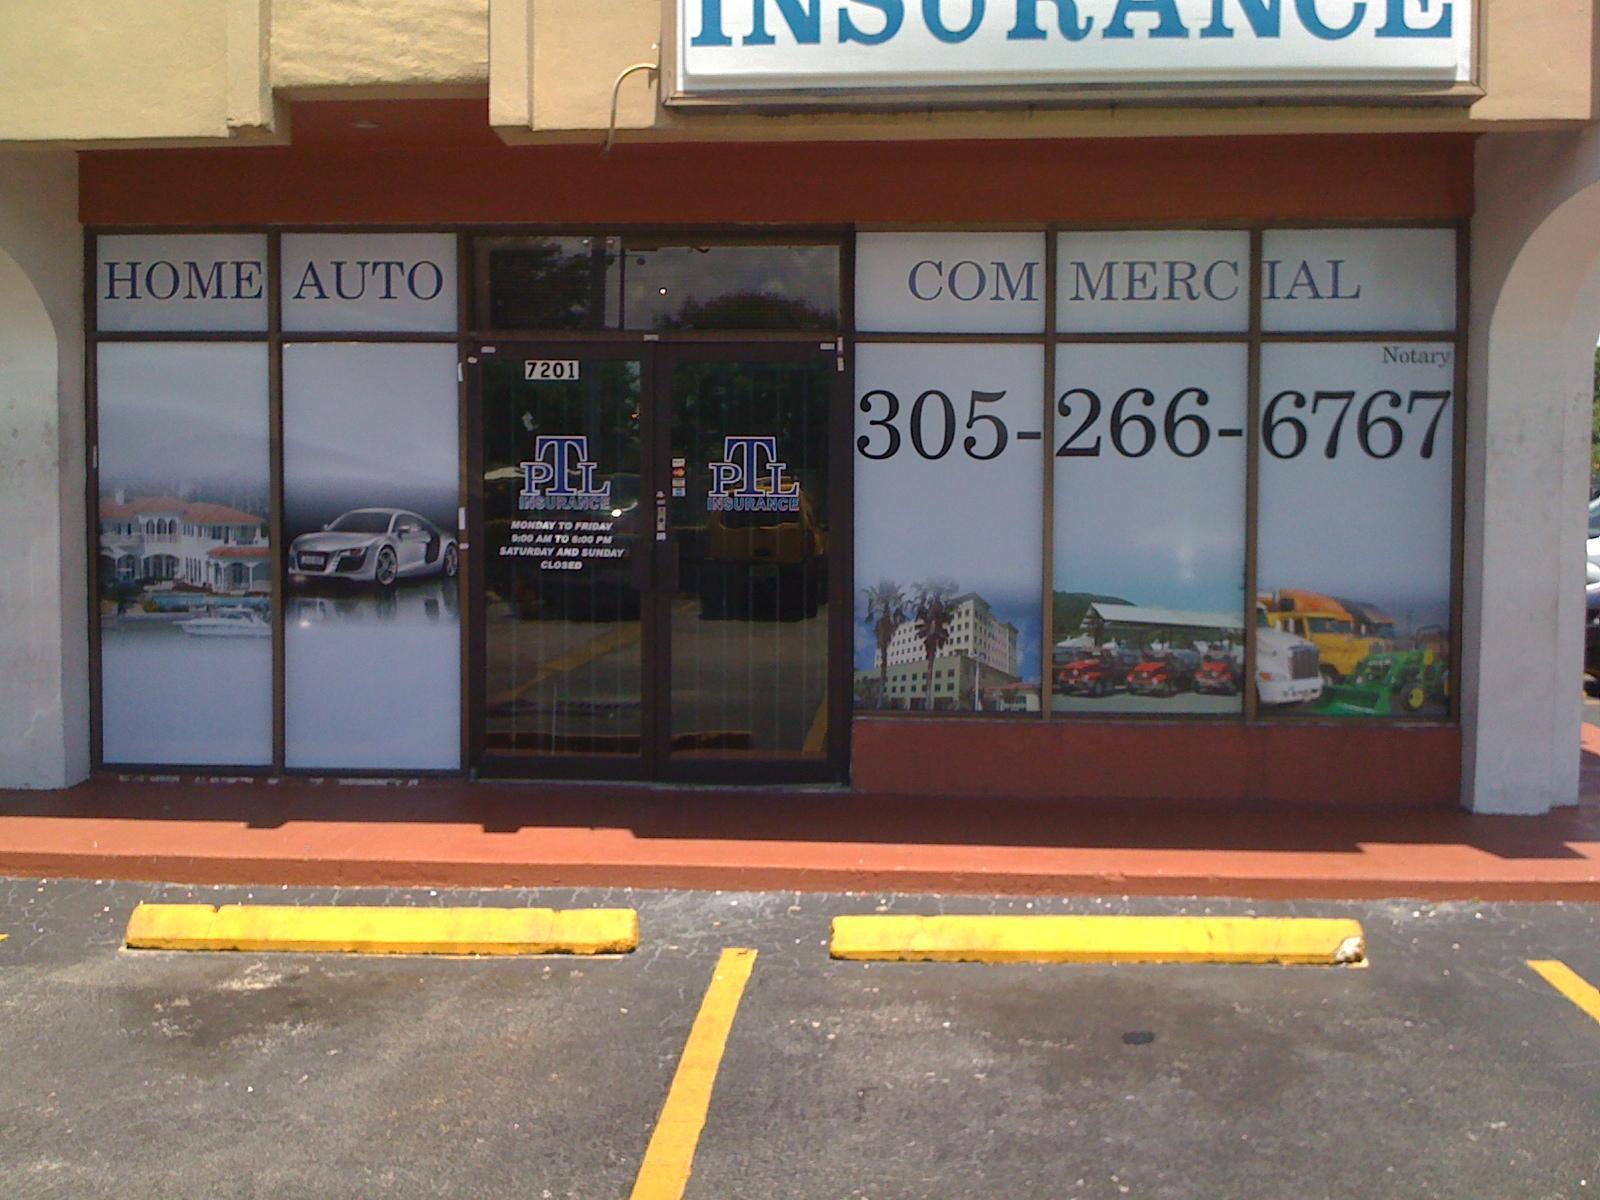 PTL Insurance Associates, Inc